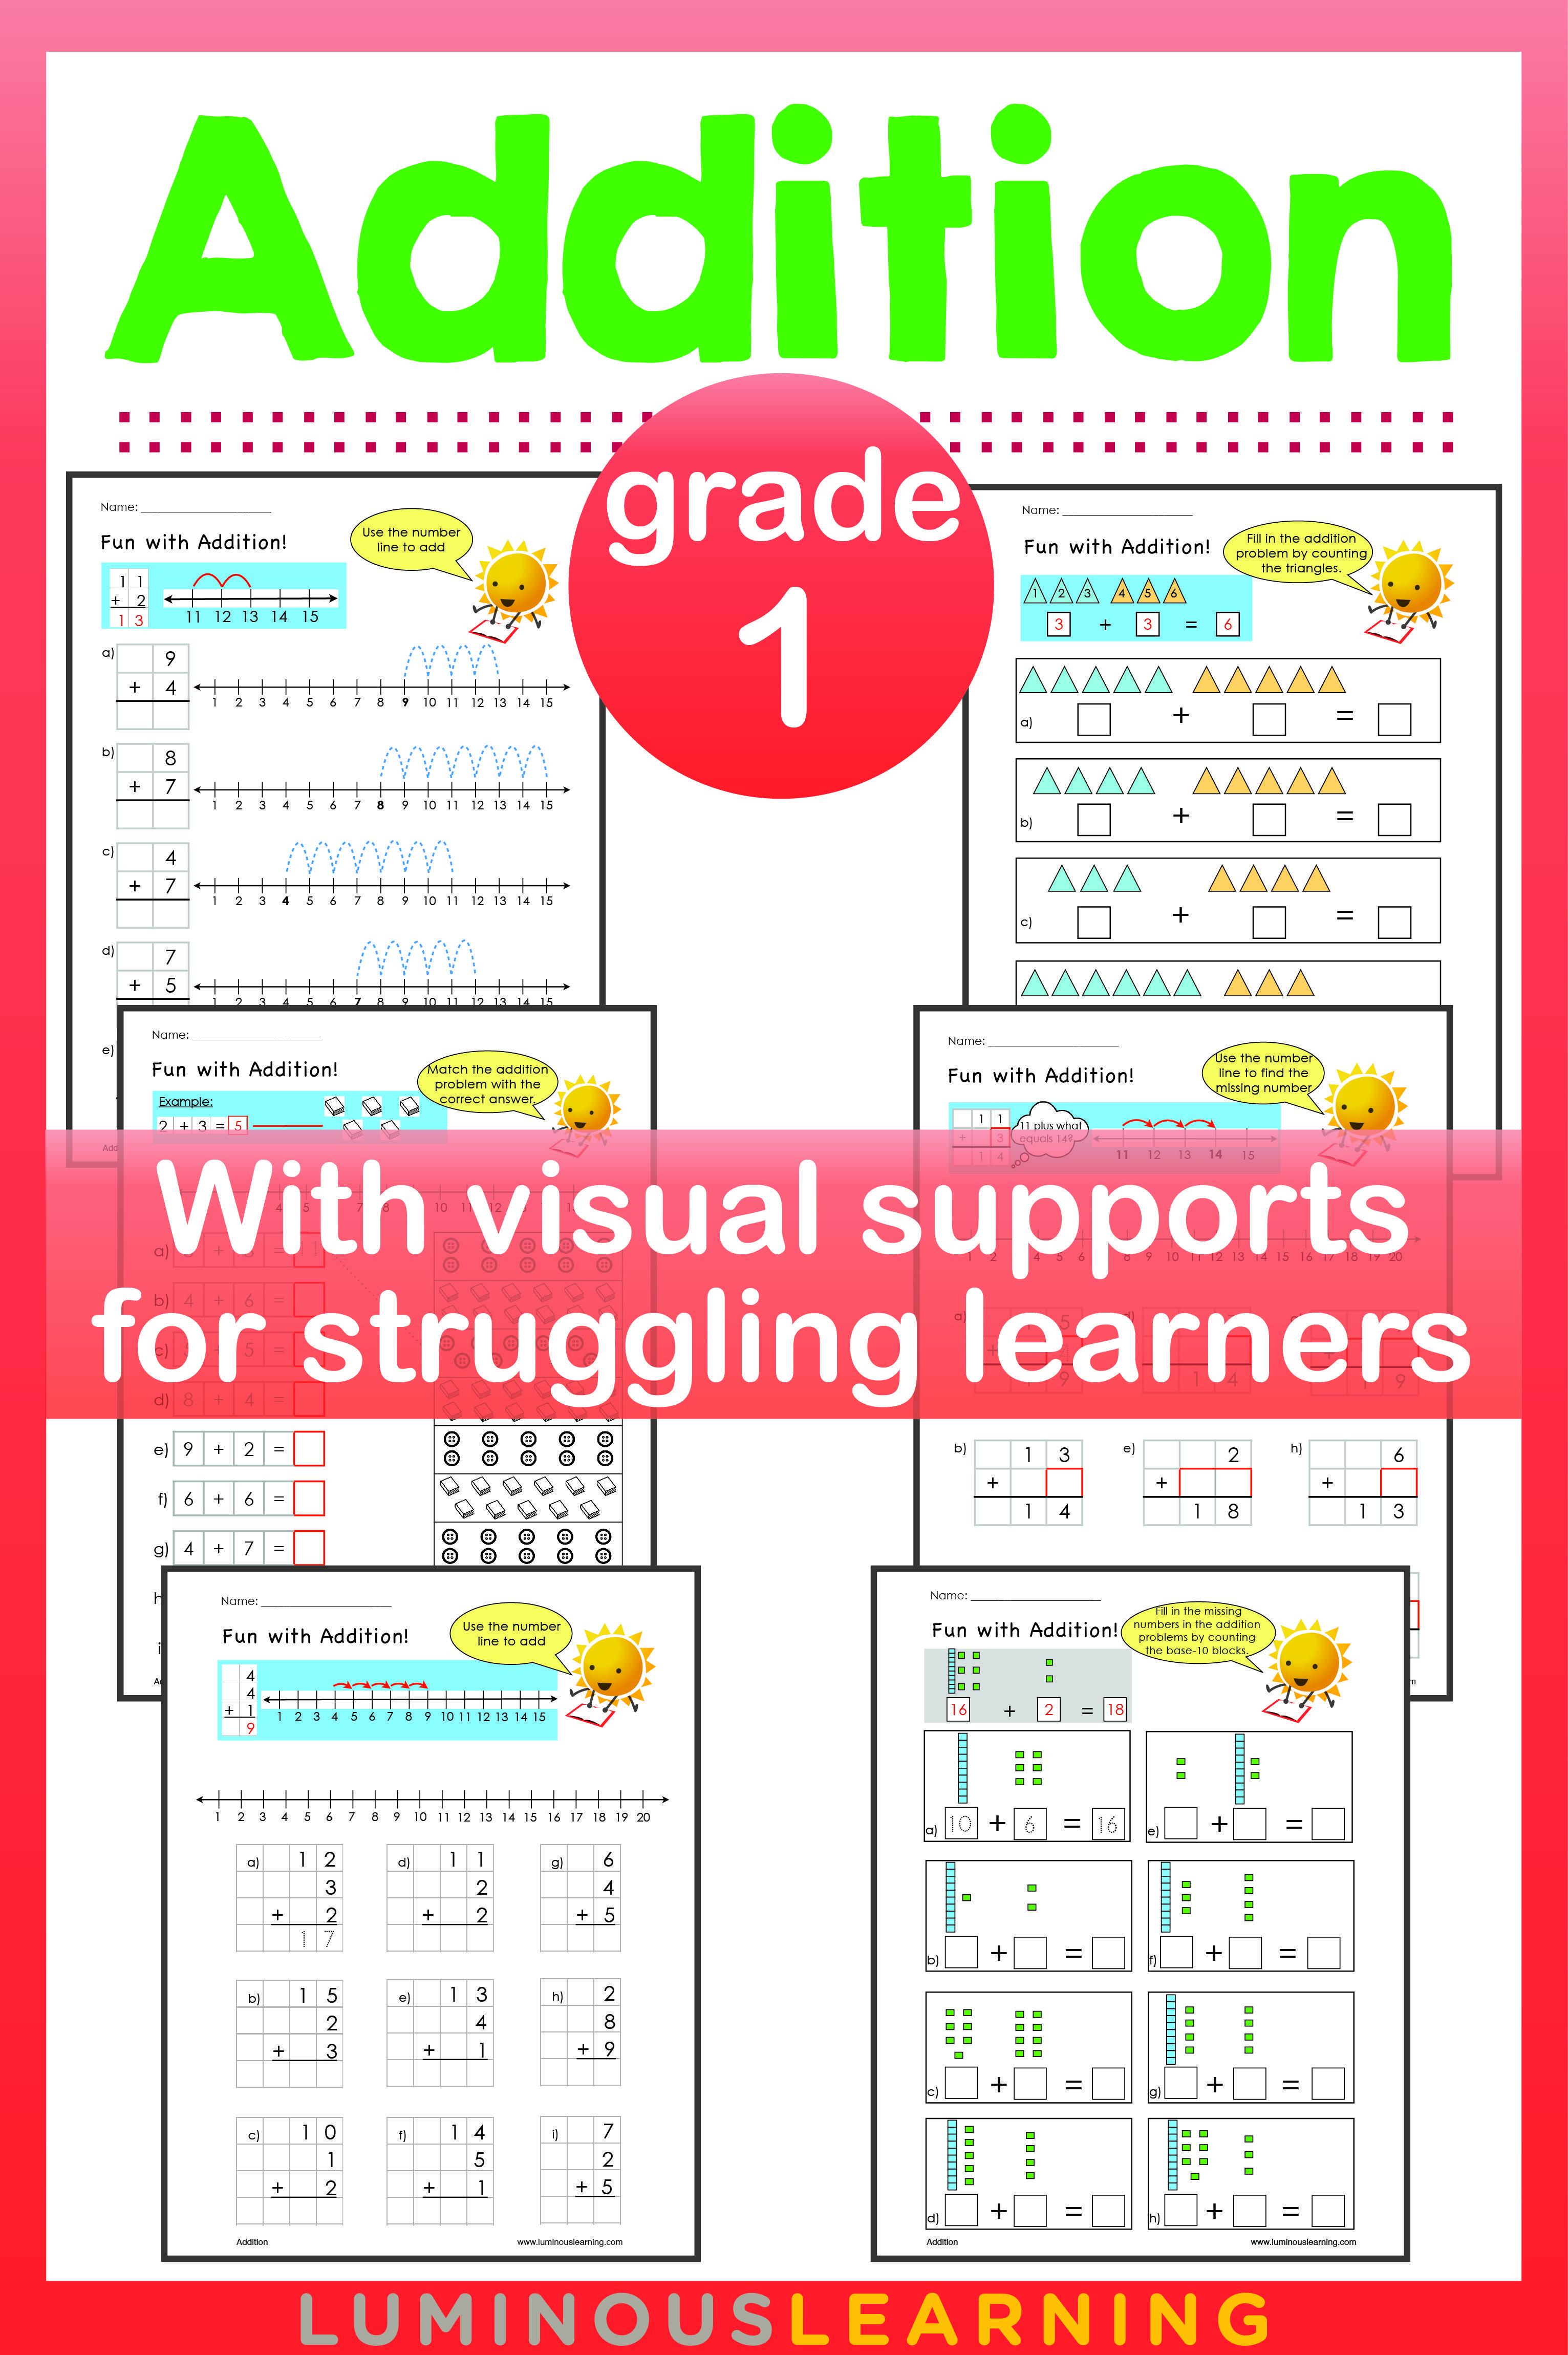 Luminous Learning Grade 1 Addition Workbook Provides Math